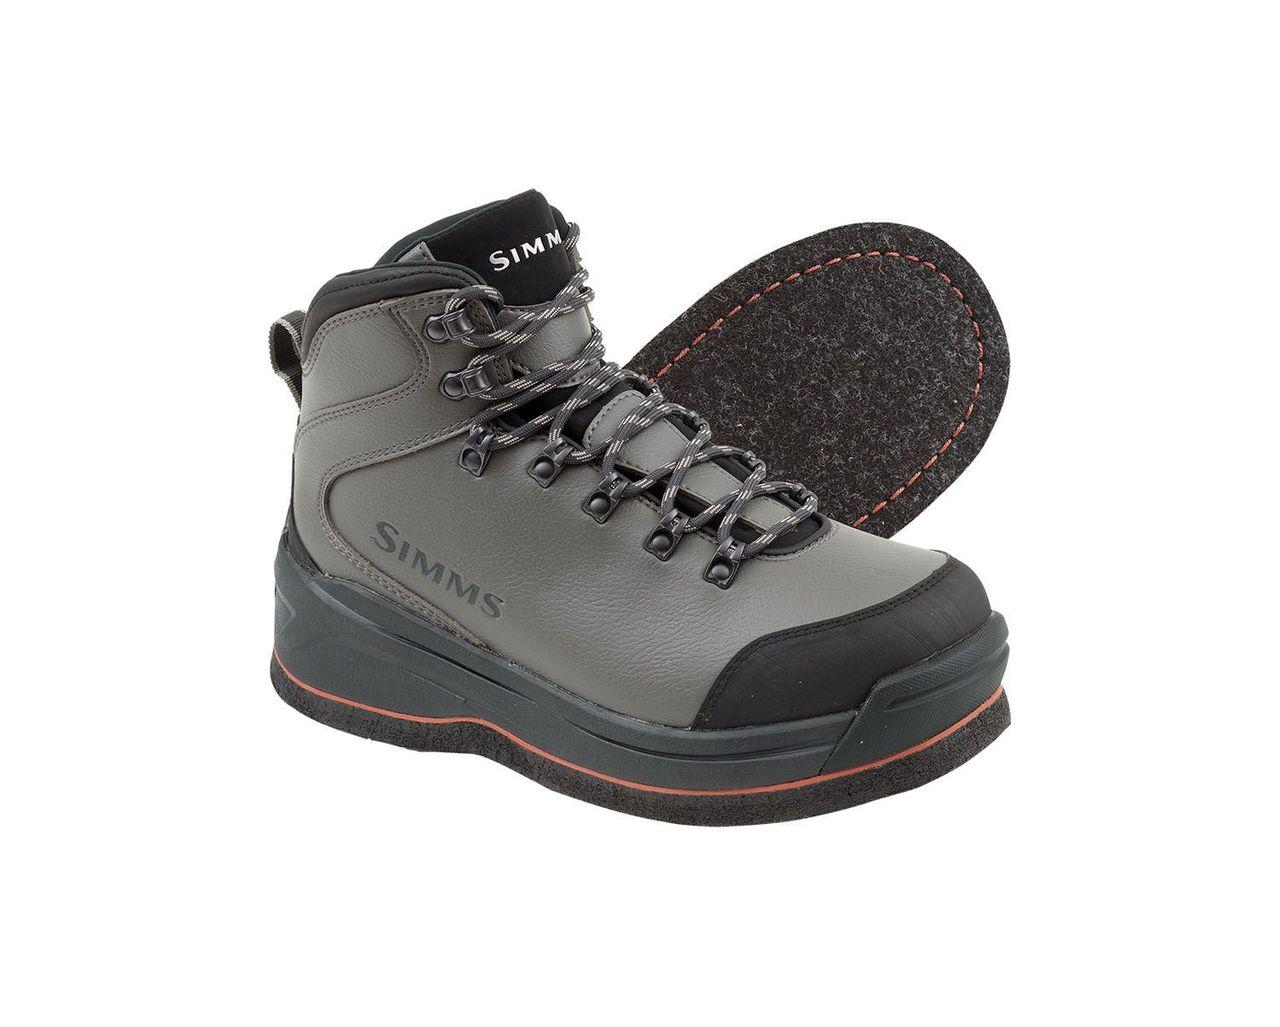 Chaussures Simms Femme - Freestone Boot Felt- Pointure 37